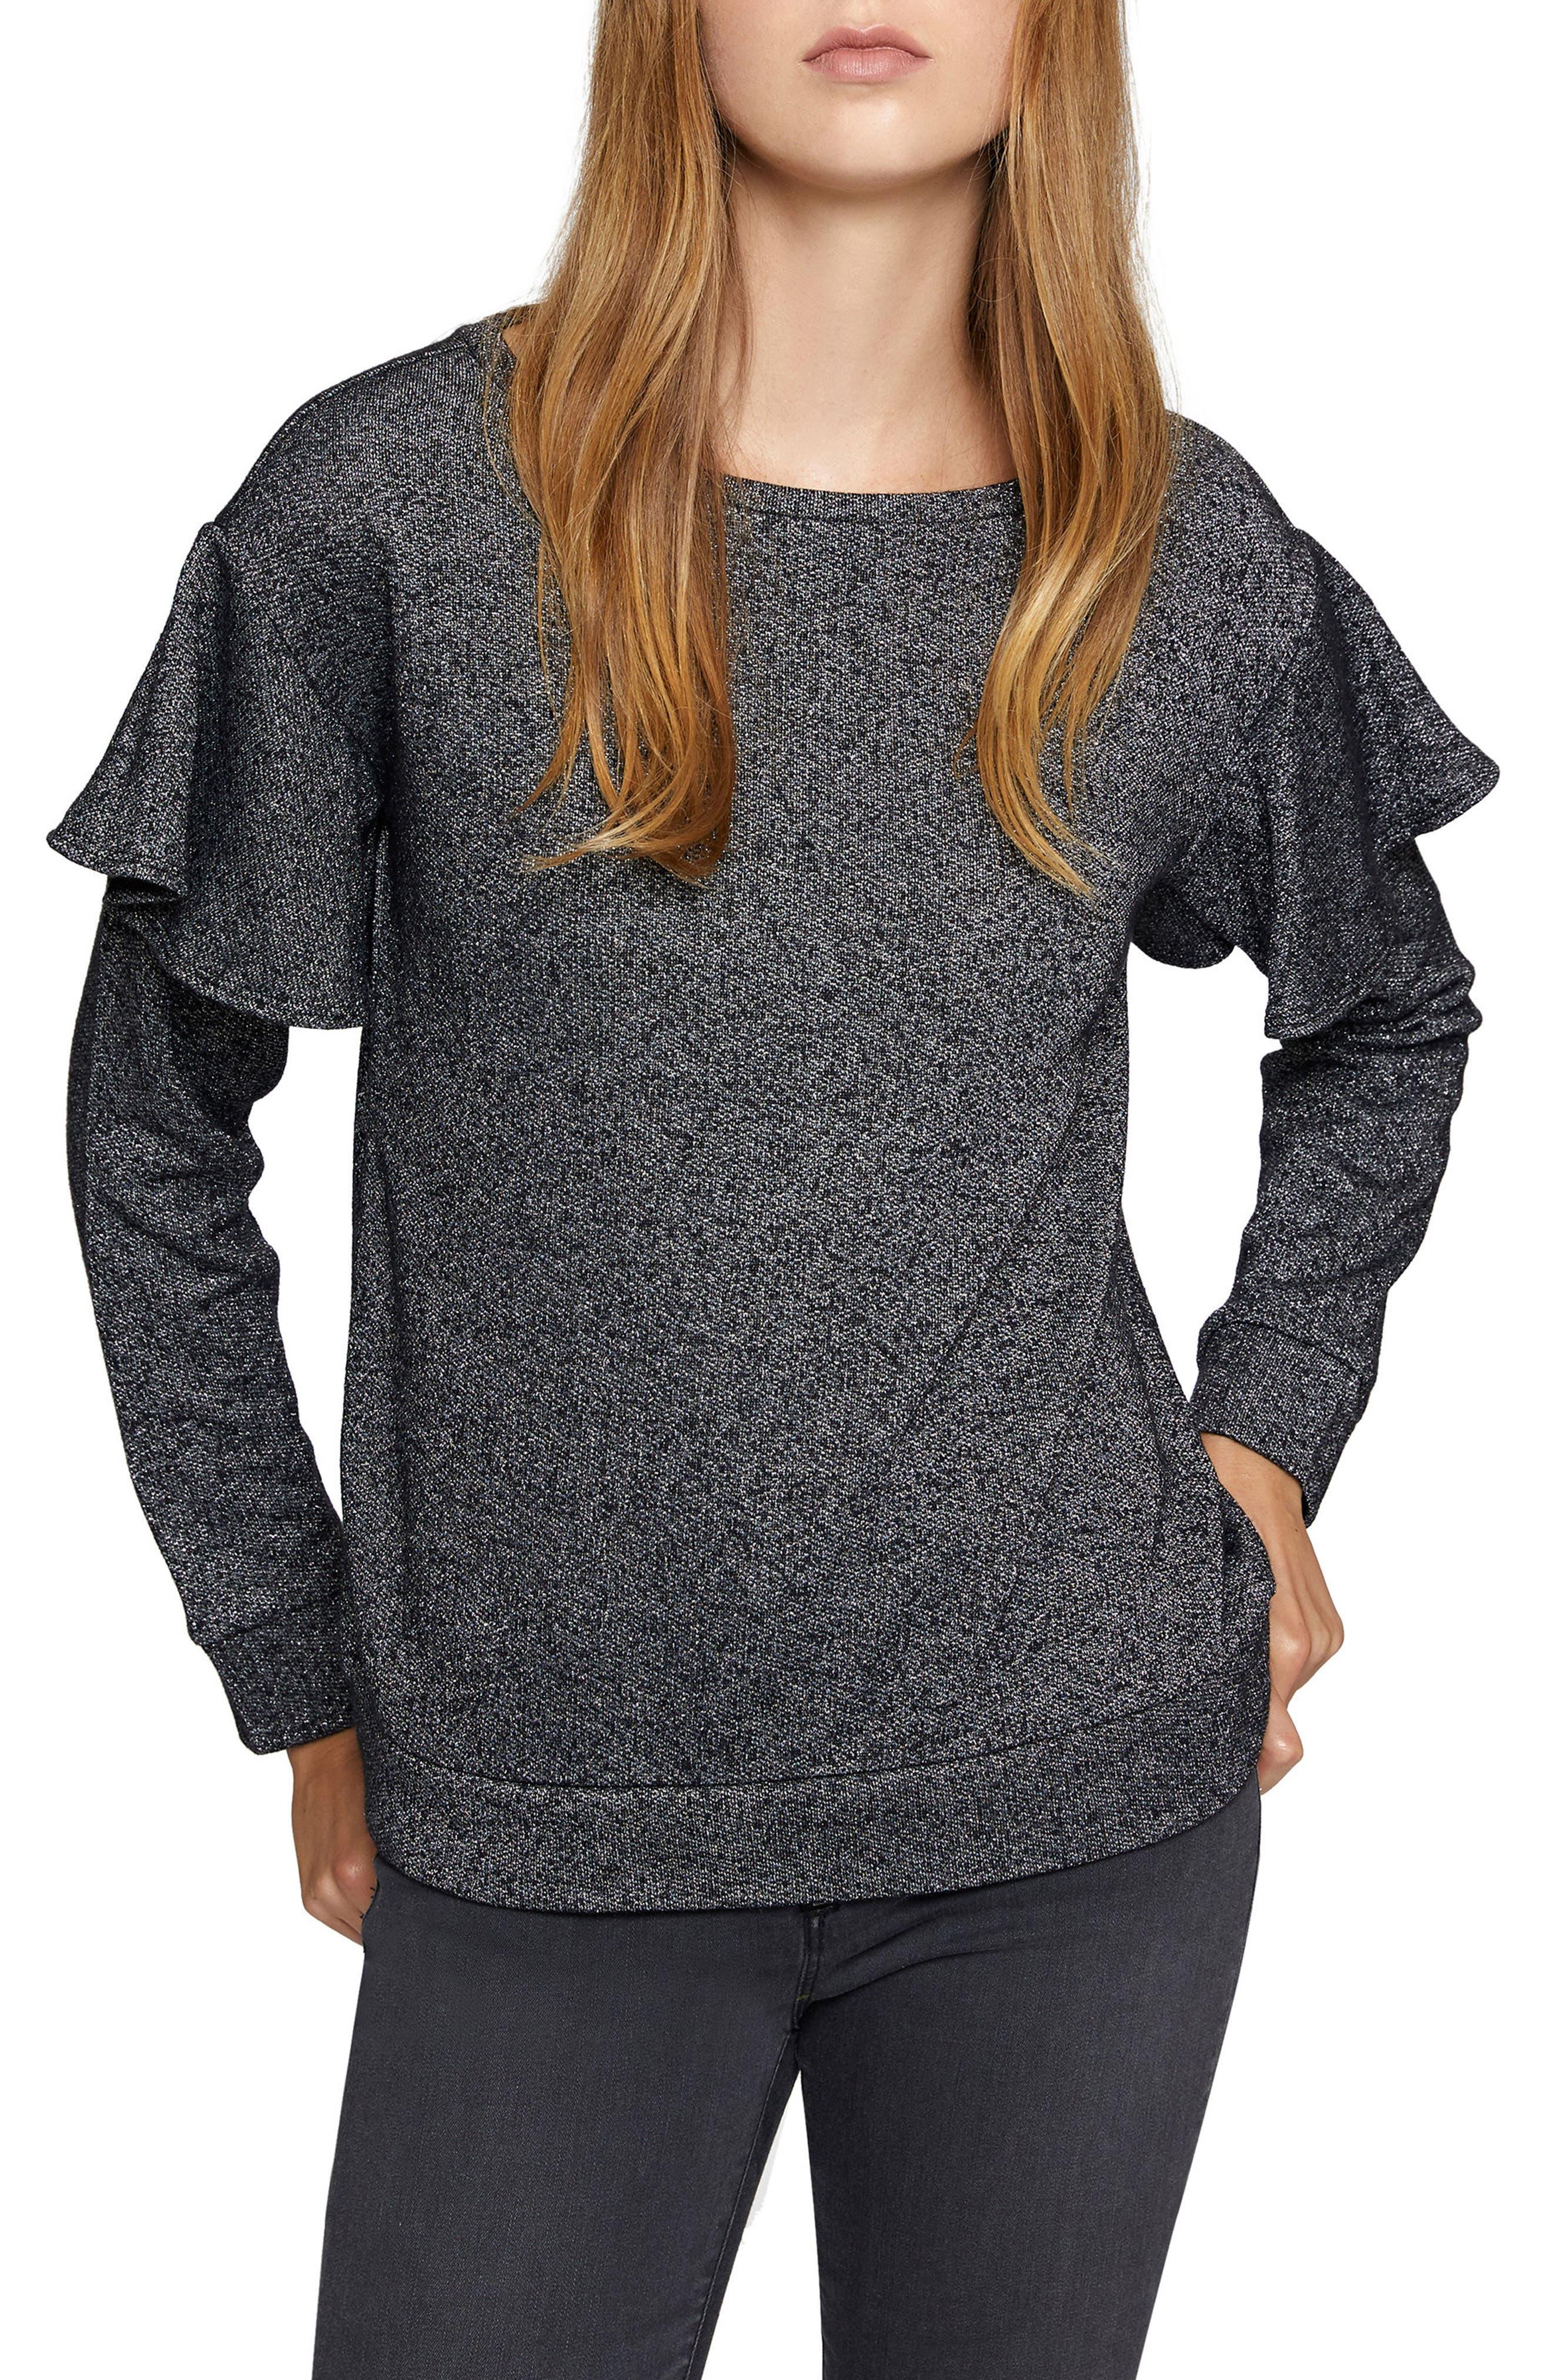 Dominique Metallic Sweatshirt,                         Main,                         color, Black